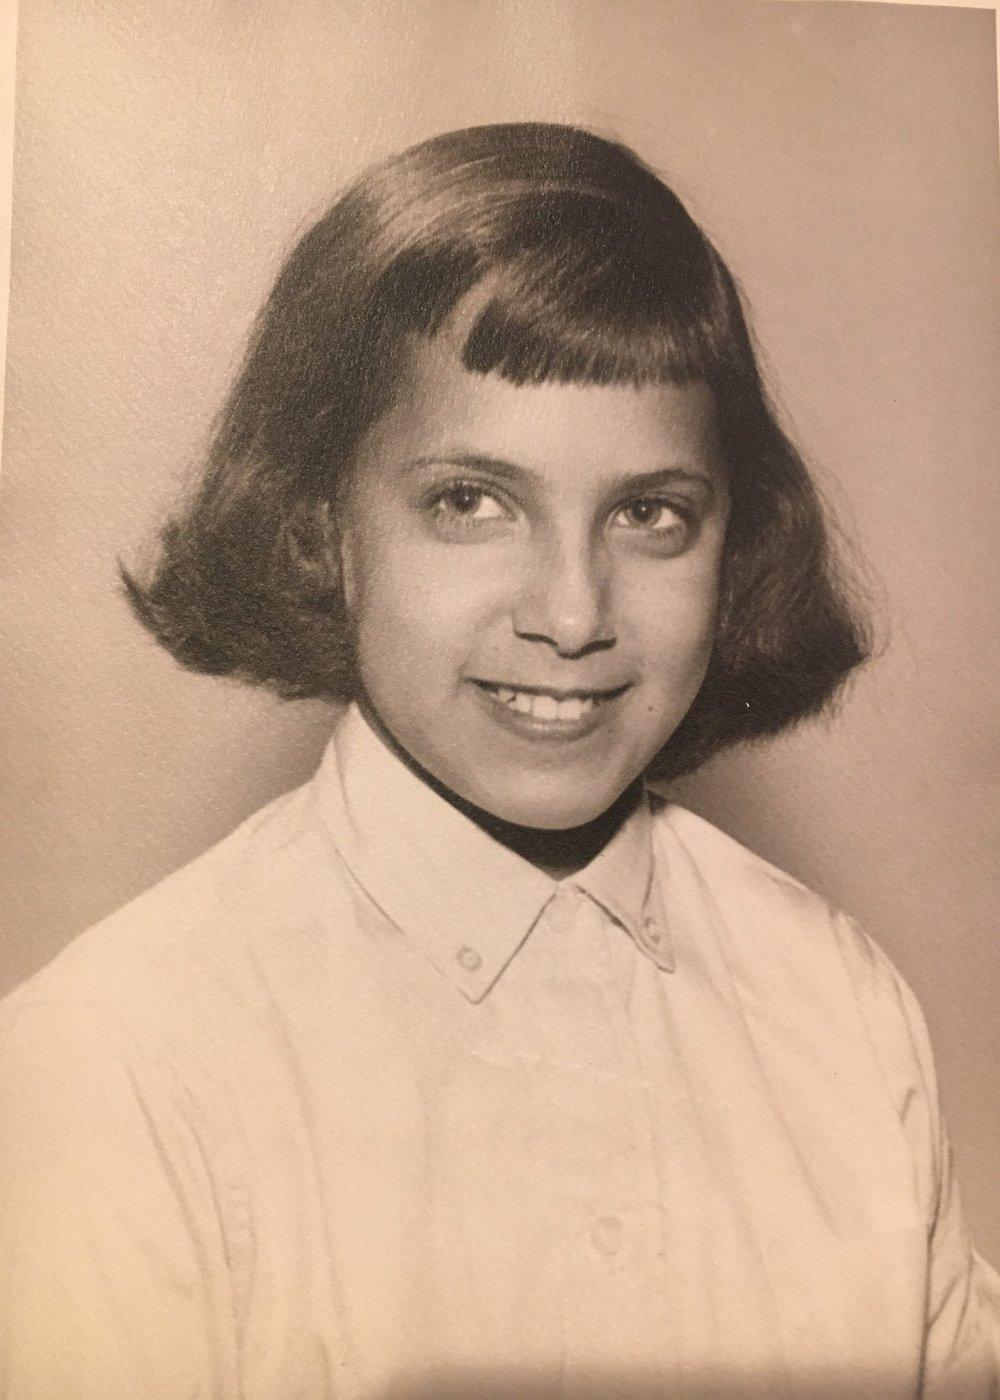 Linda portrait, age 10